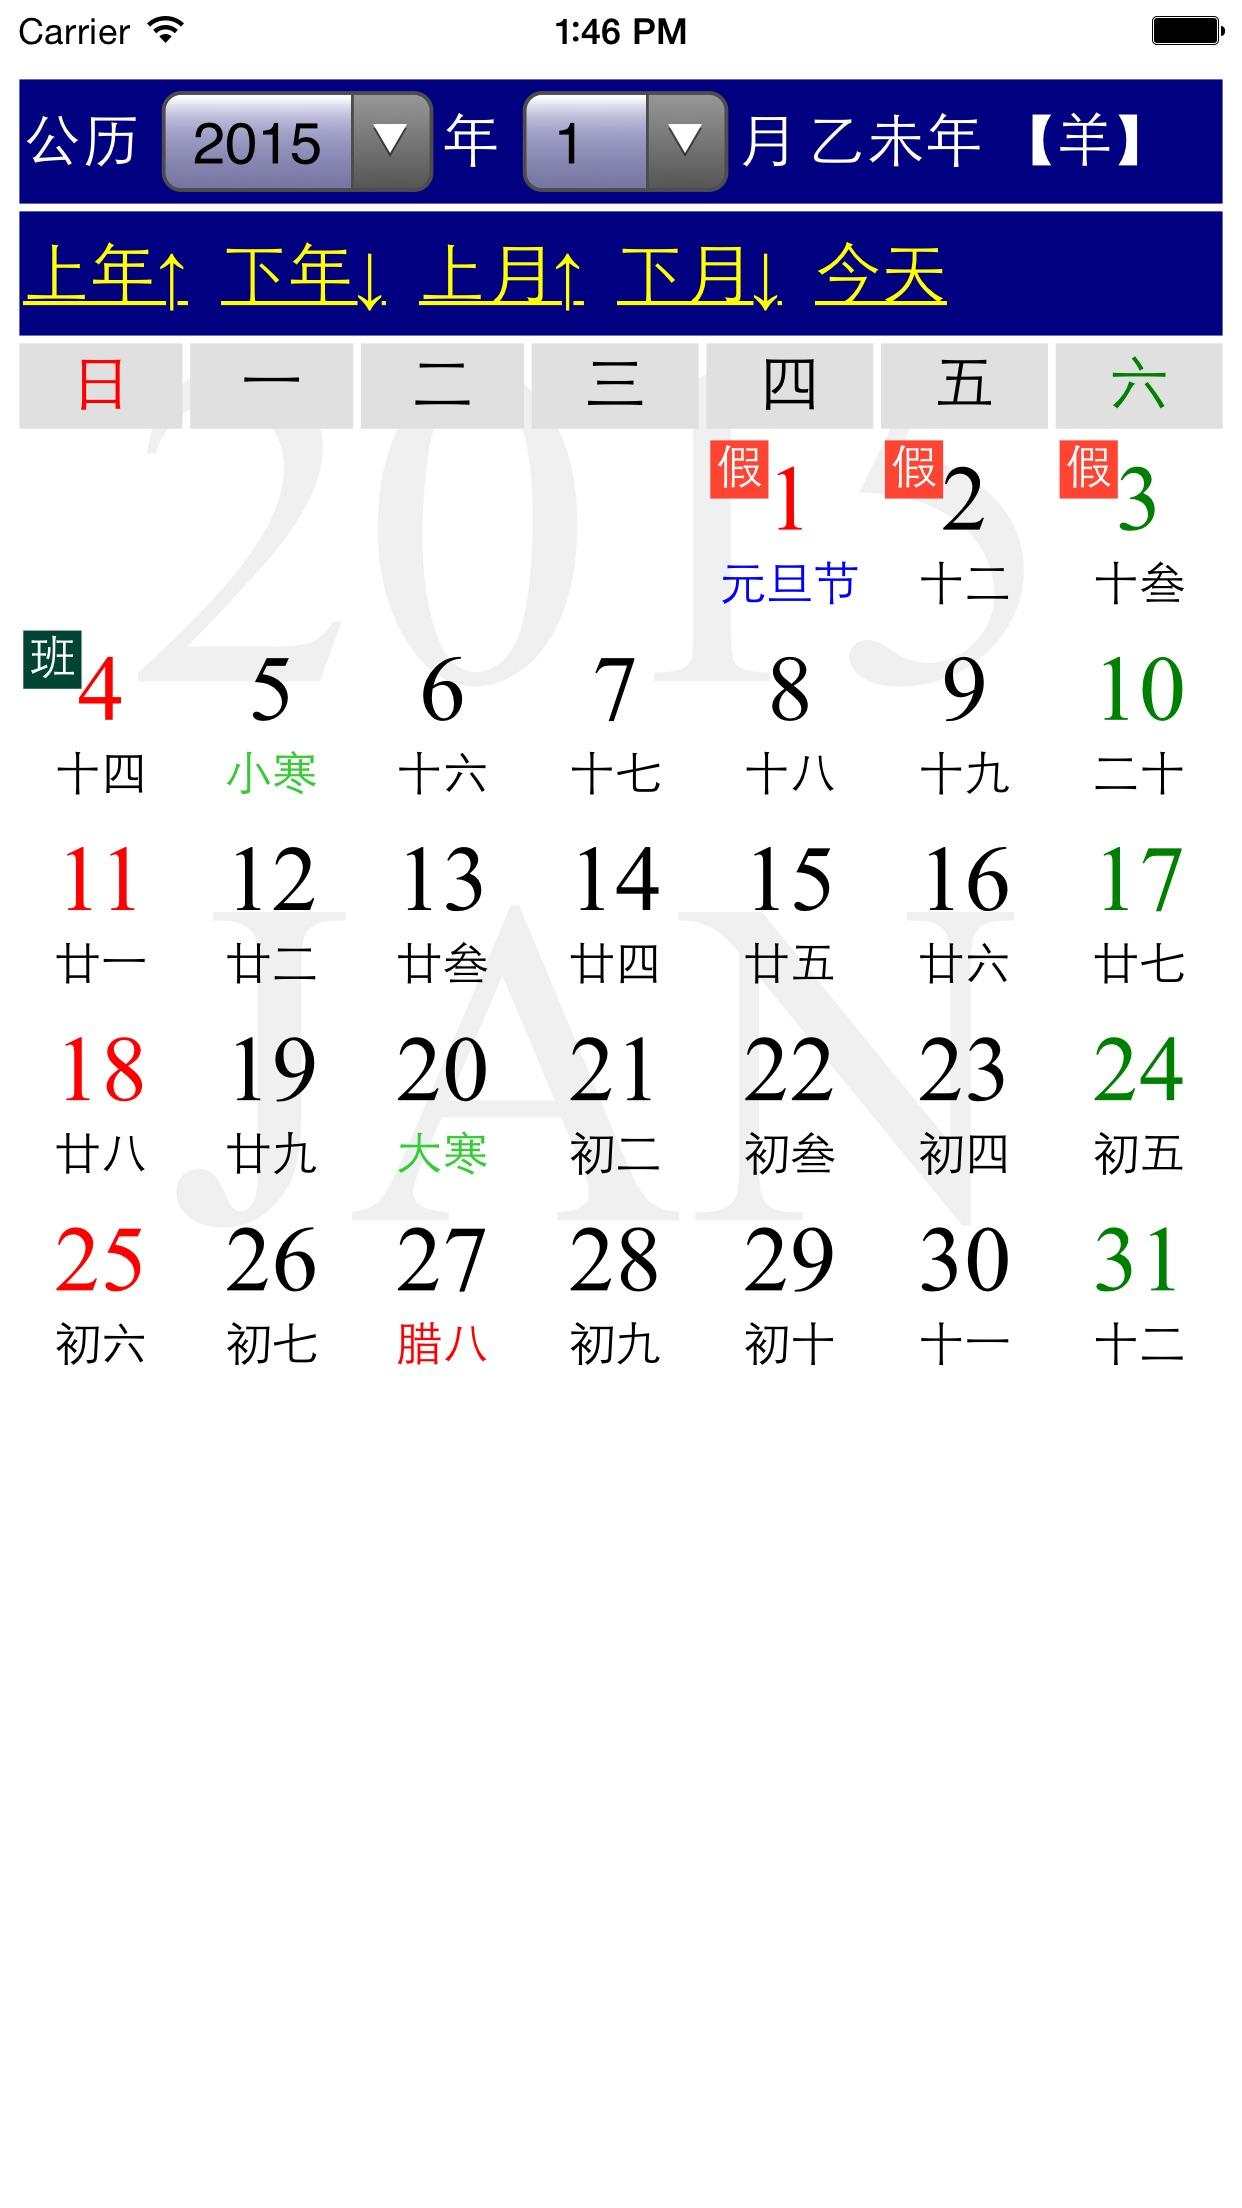 Chinese Calendar - 万年历 Screenshot